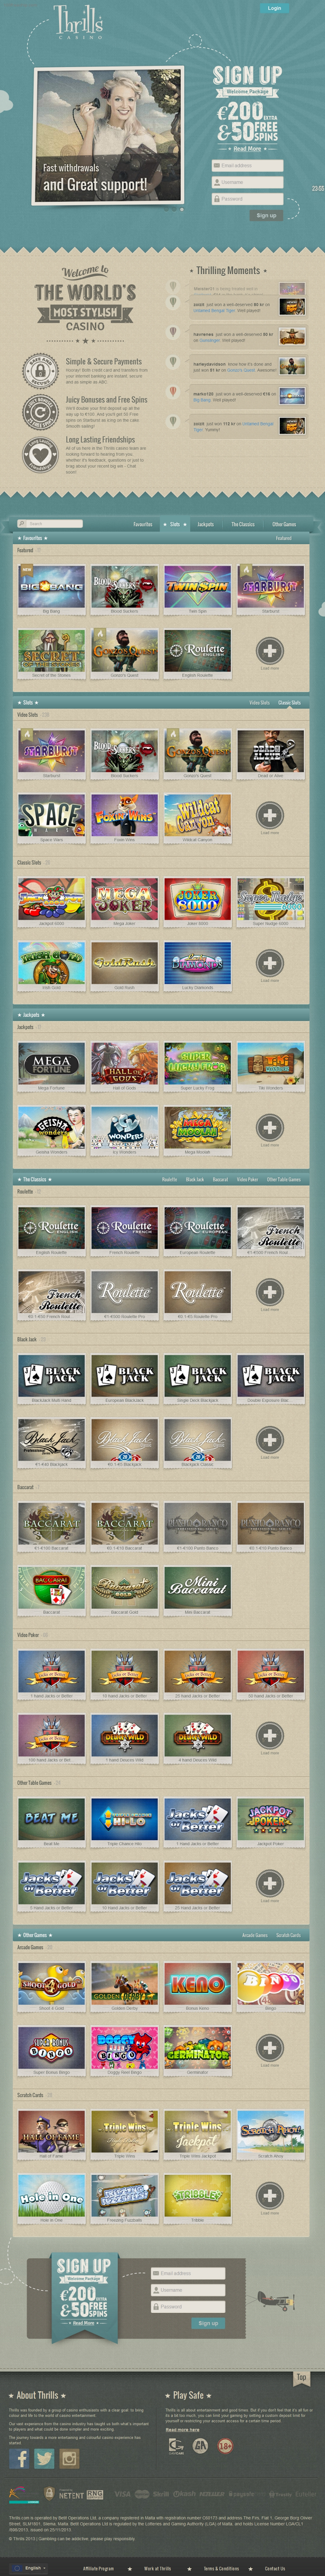 Thrills casino coupons